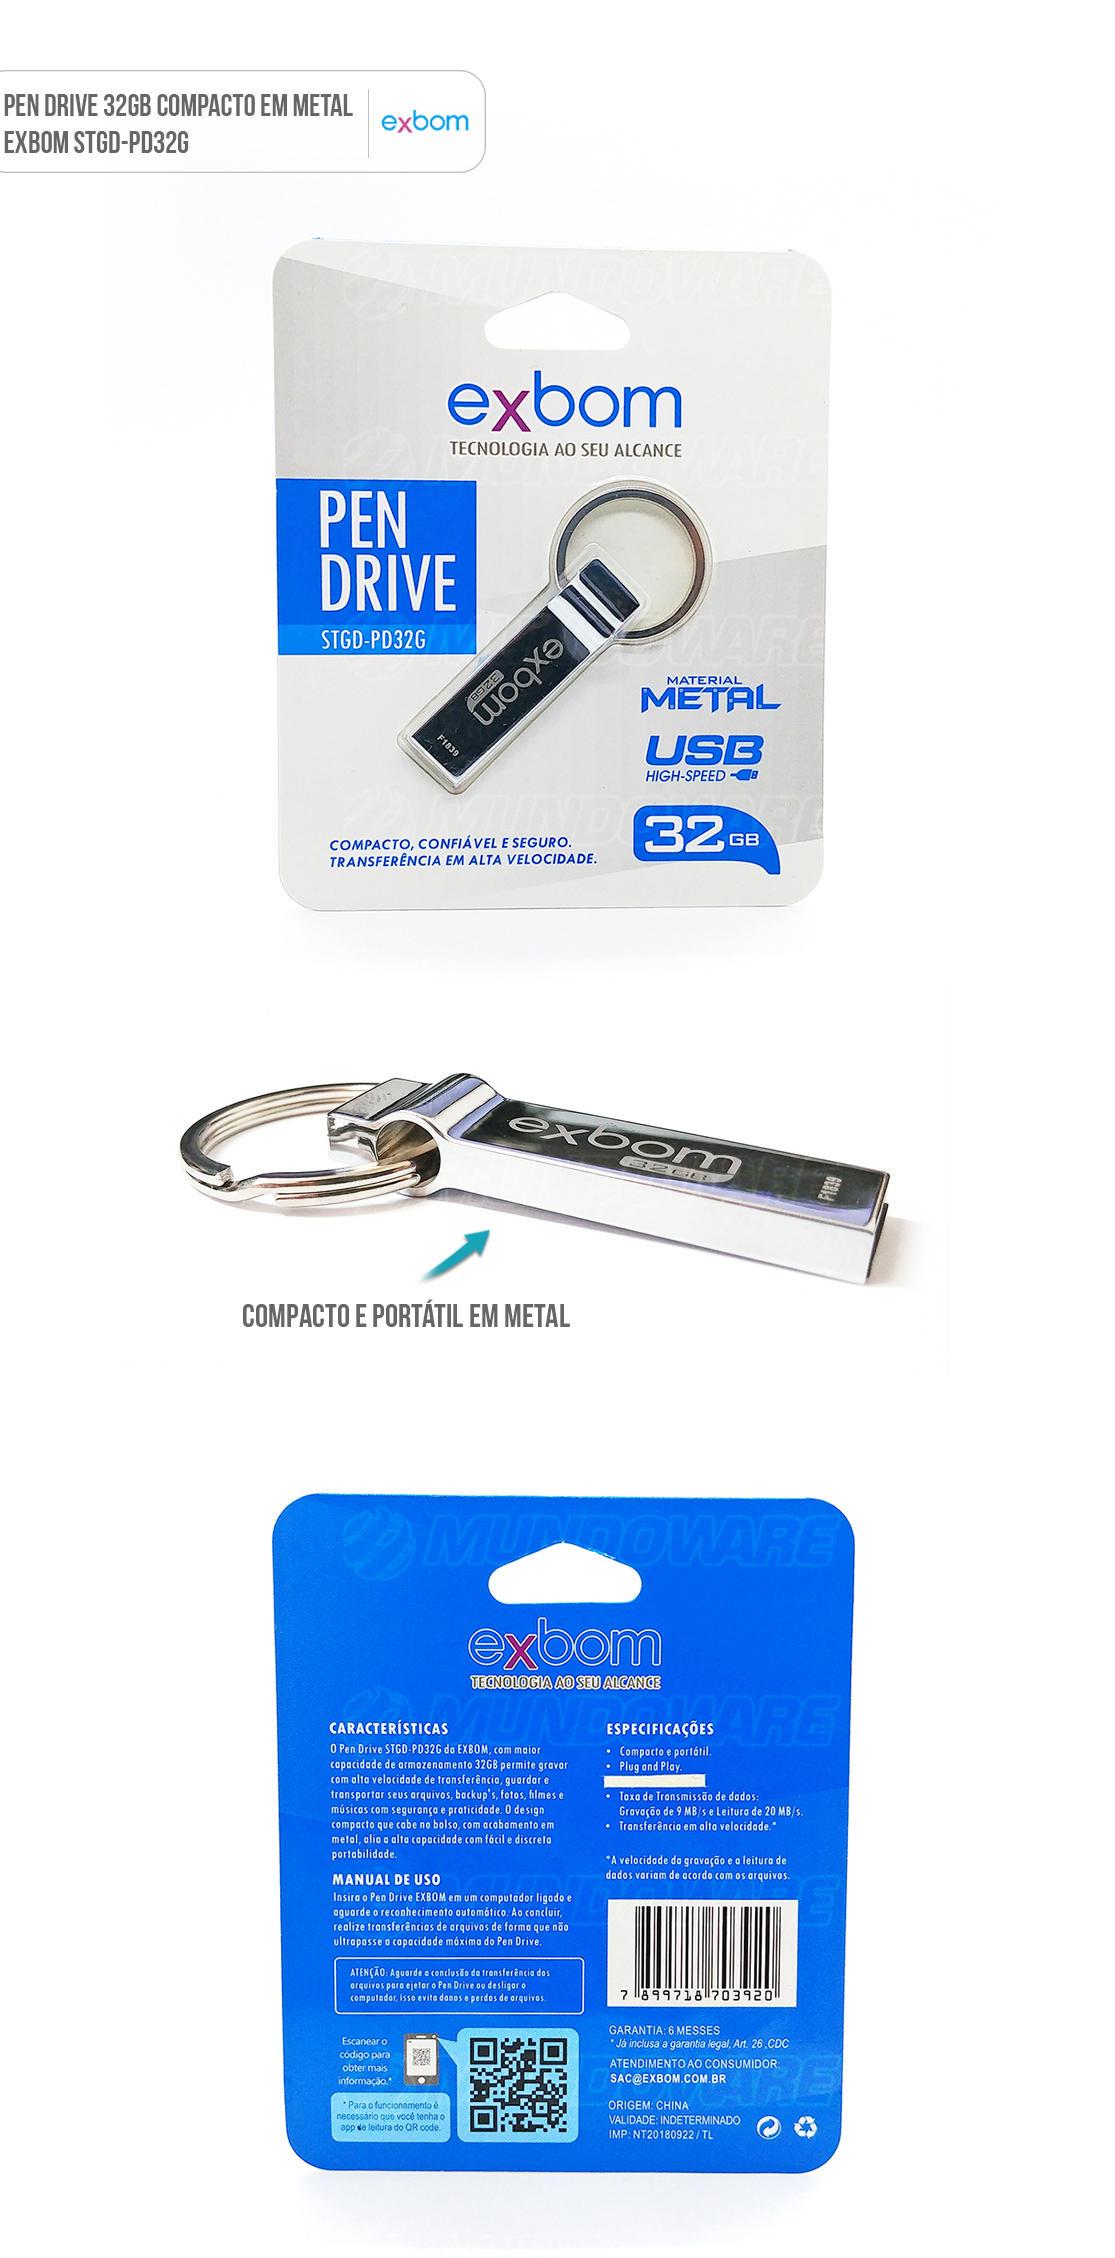 Pendrive 32GB compacto em metal prateado